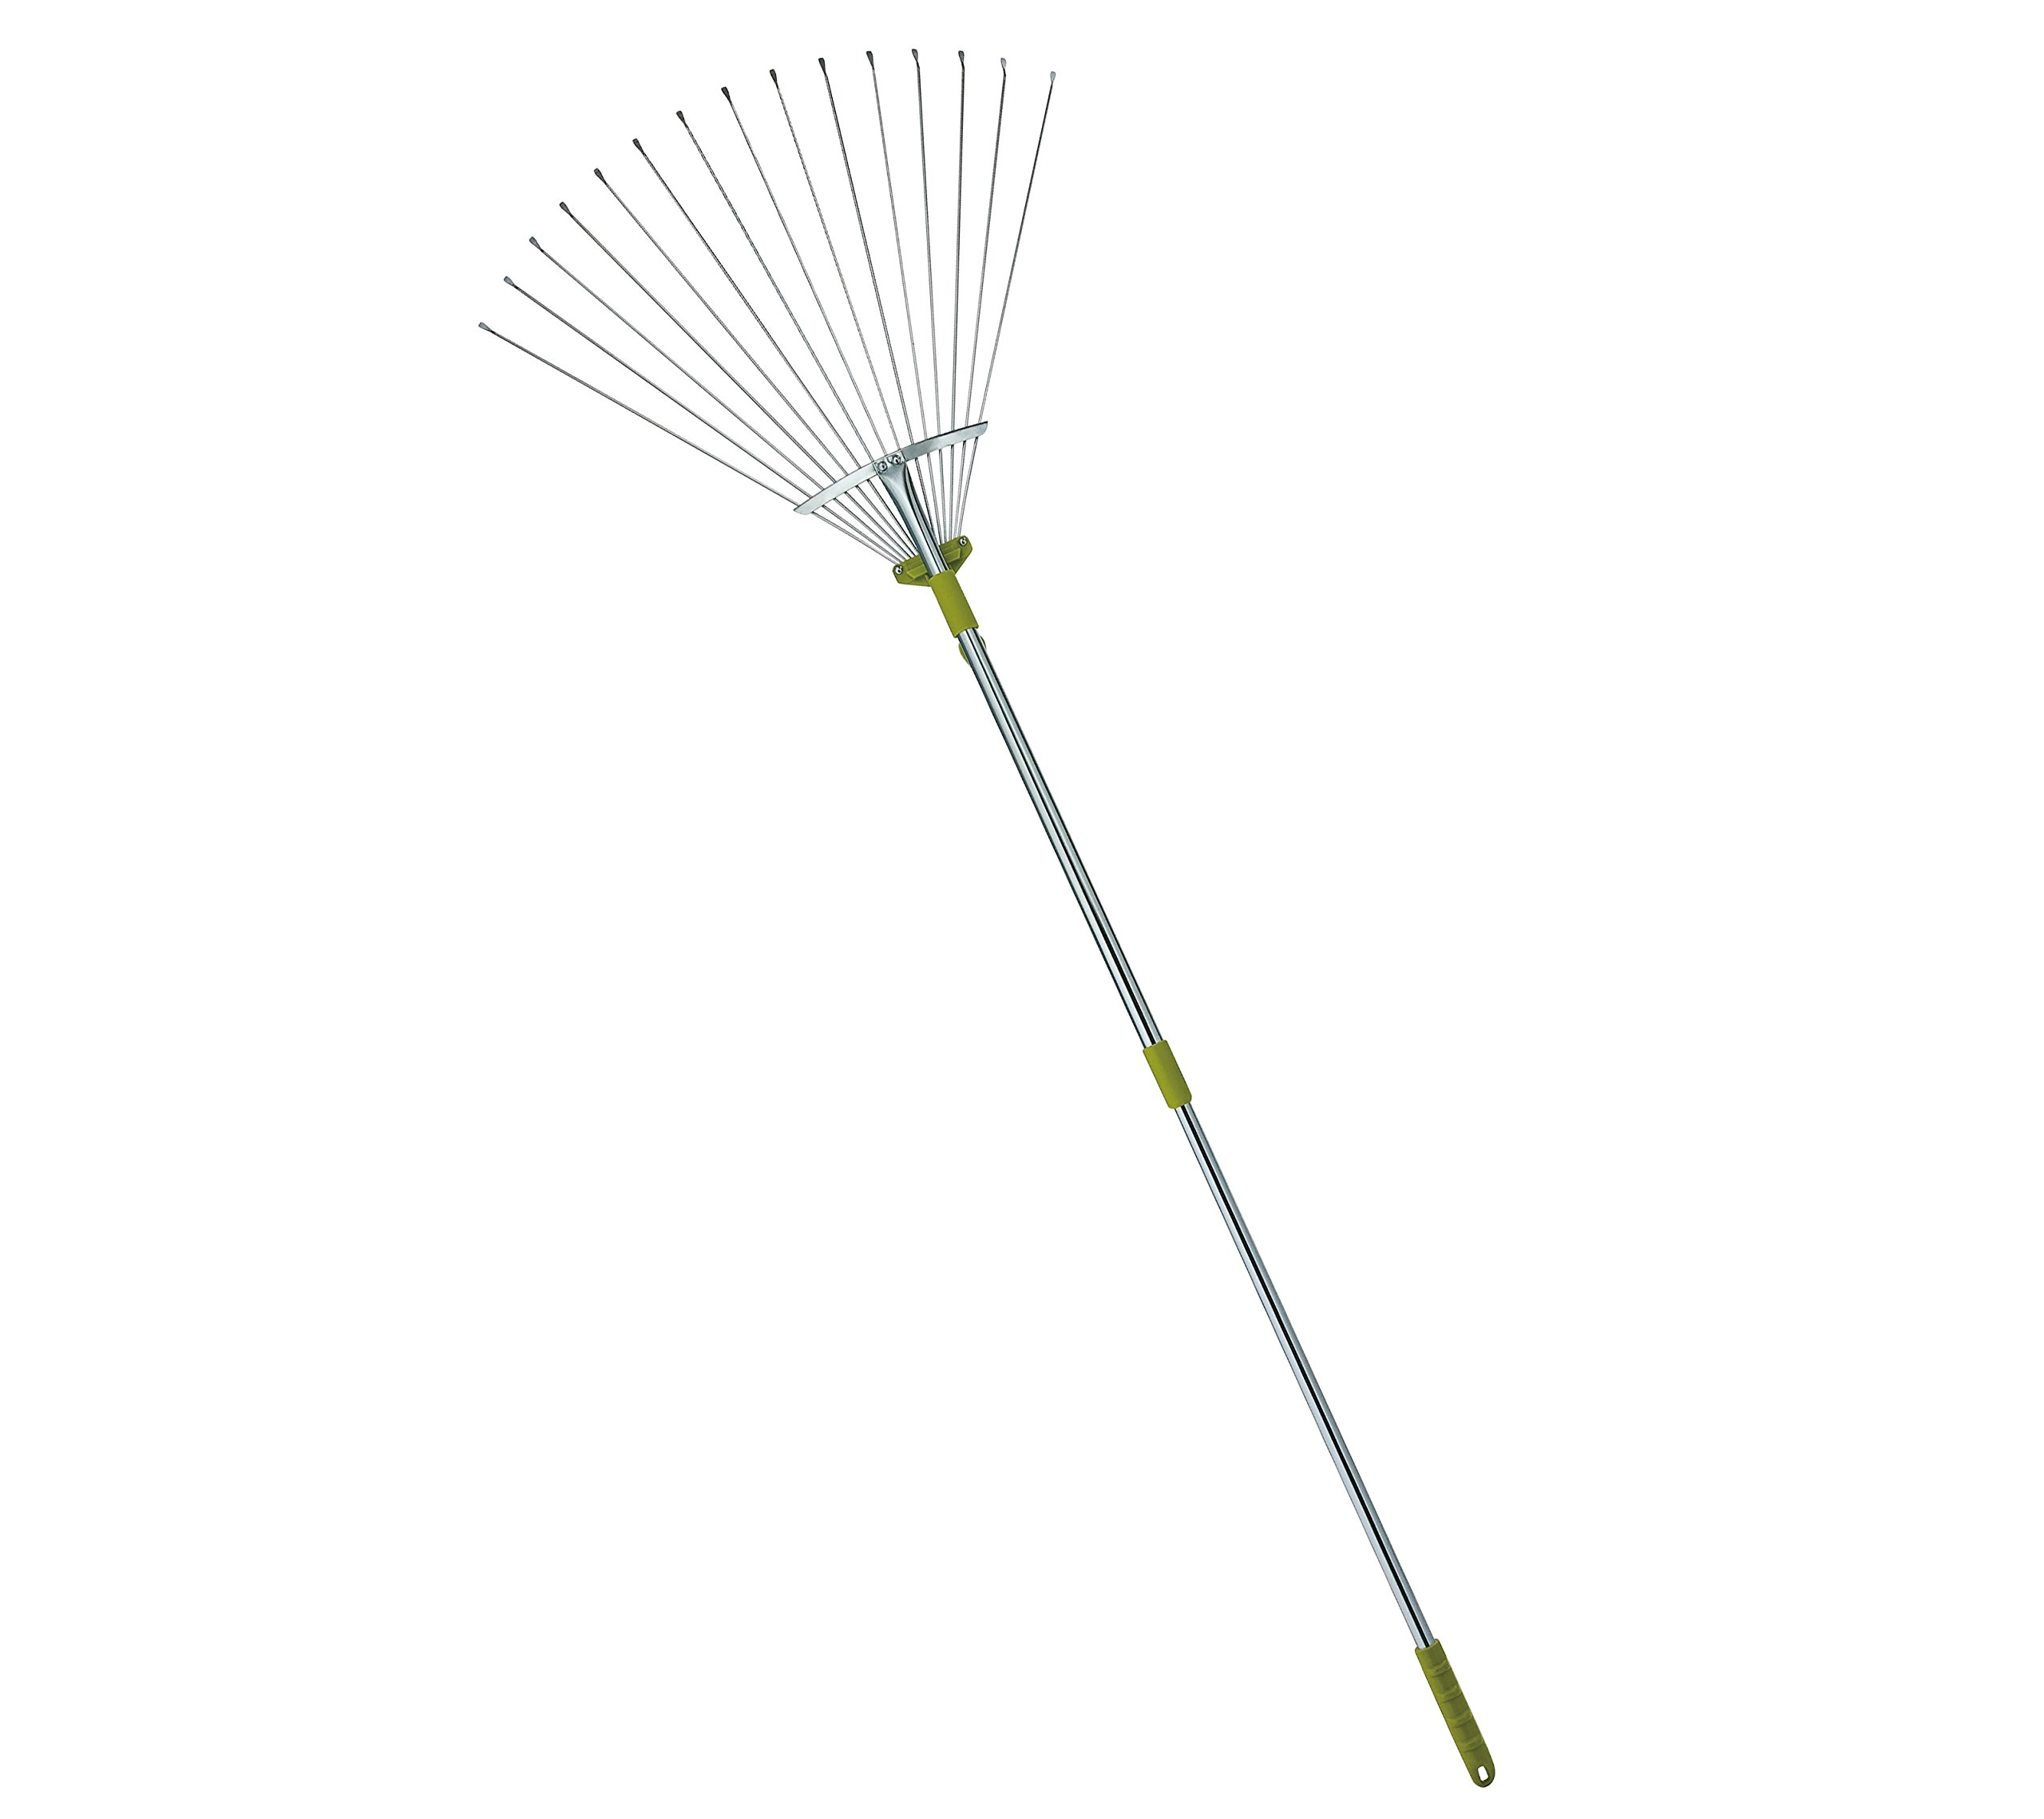 MLTOOLS Leaf Rake | 64-inch Adjustable Garden Leaf Rake | Garden Leaf Rake | Flat Tine Adjustable Steel Rake with Extendable Handle R8236